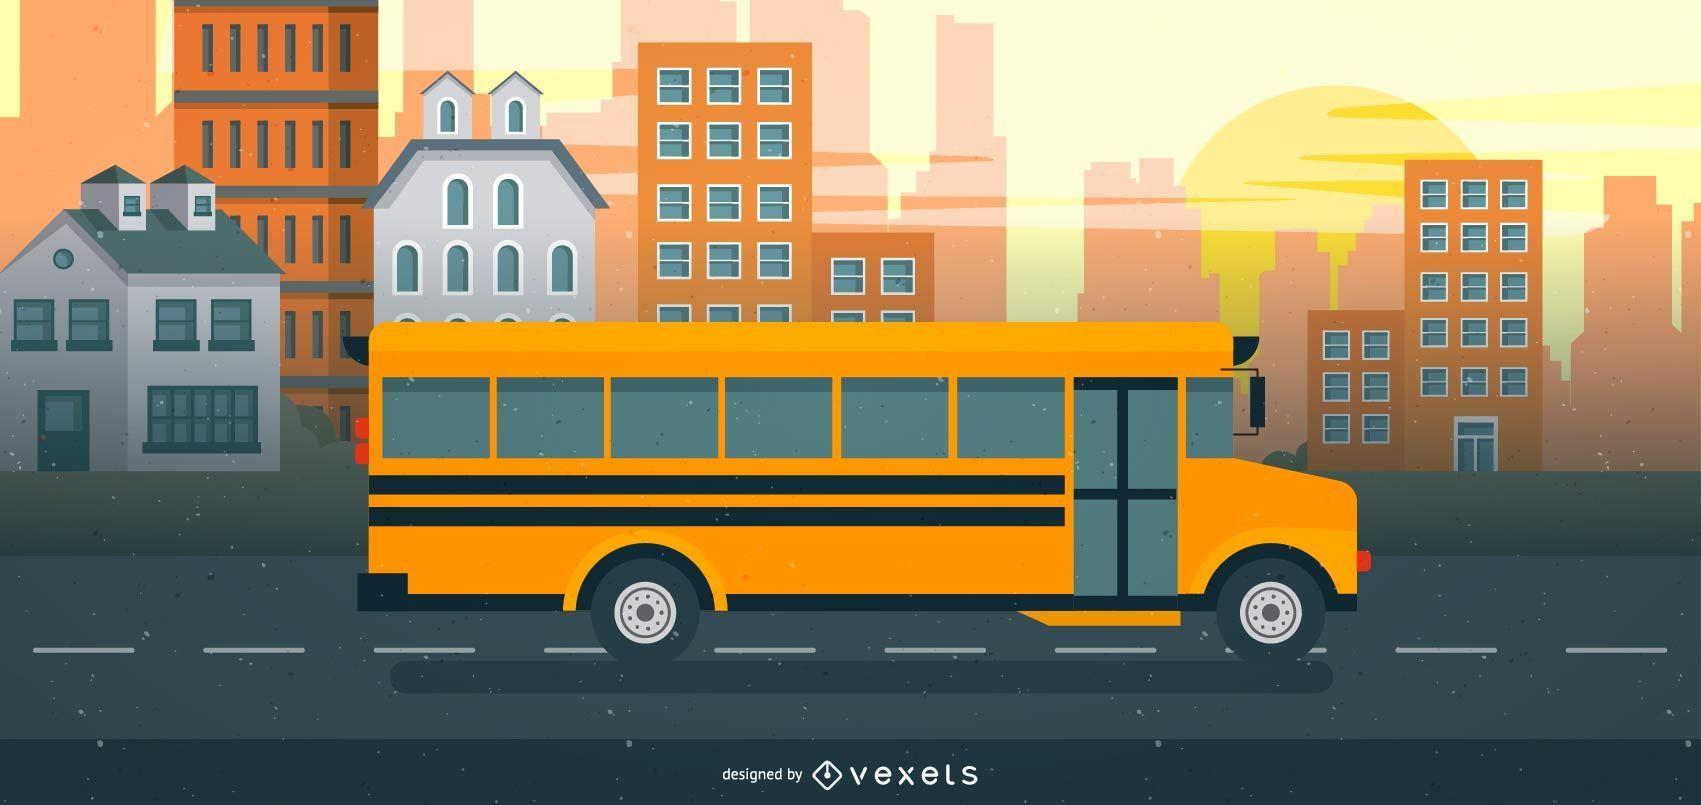 Travelling School Bus Illustration